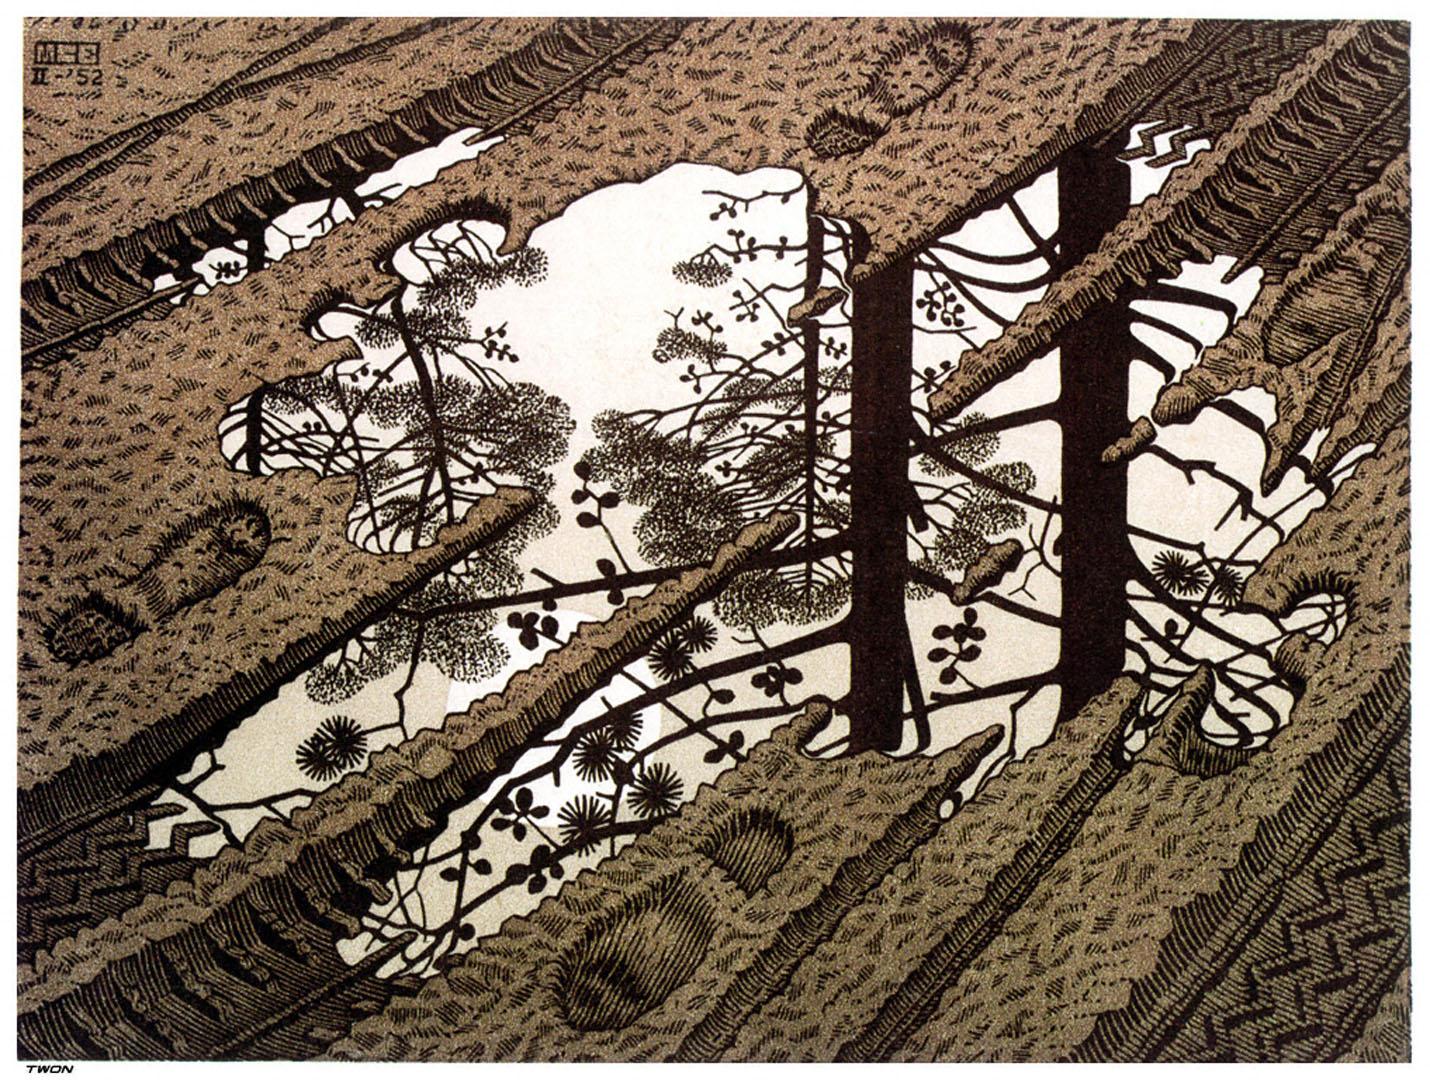 Puddle optical illusion m c escher art wallpaper picture for Mc escher gallery